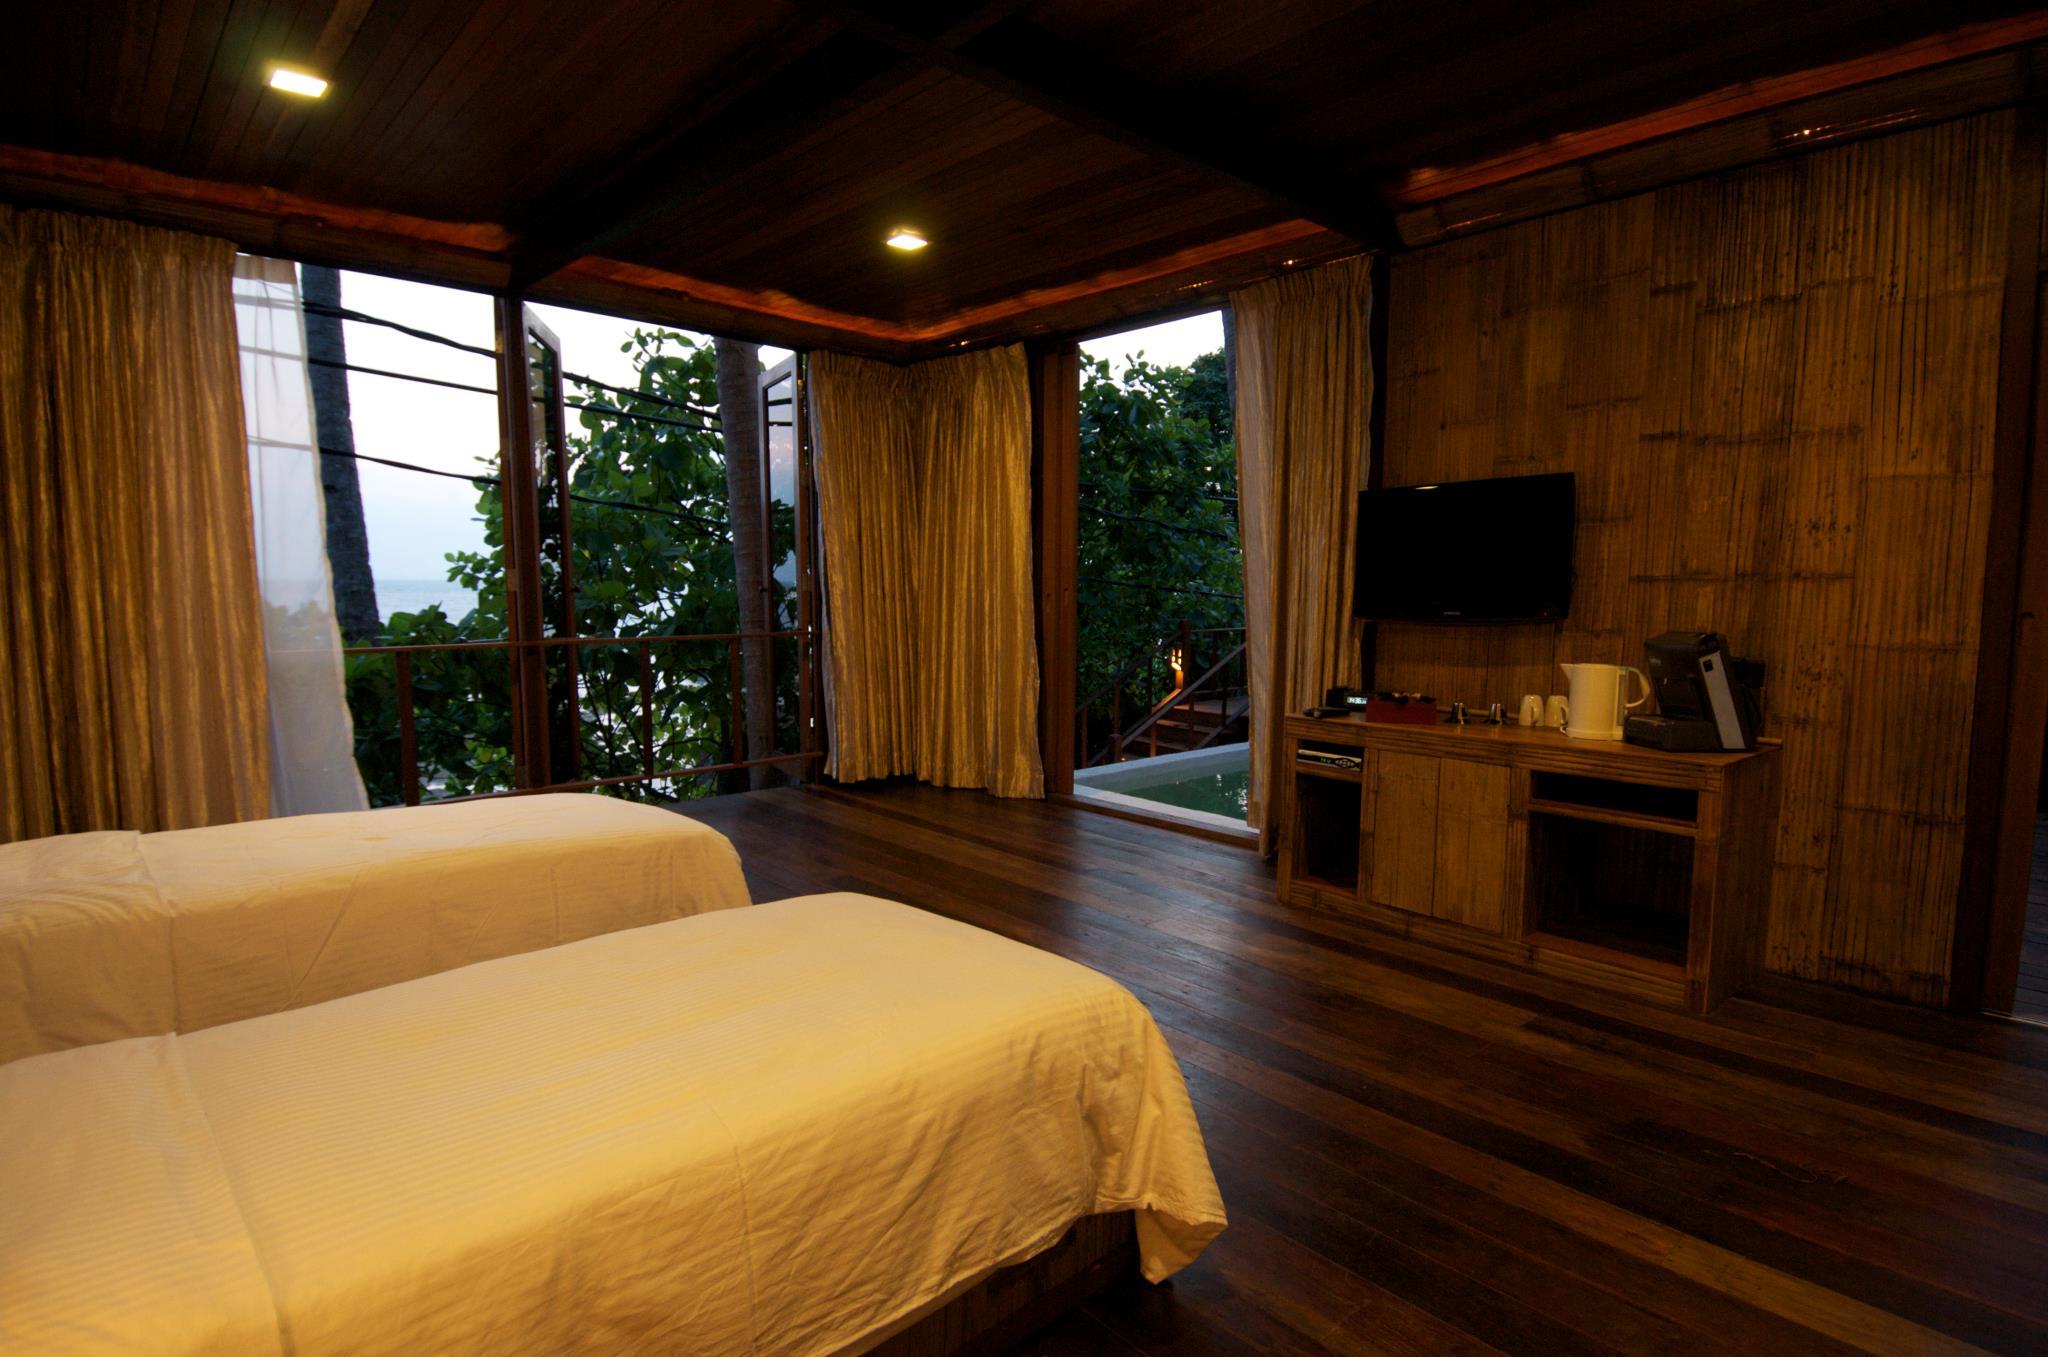 Image from Japamala Resort Pulau Tioman